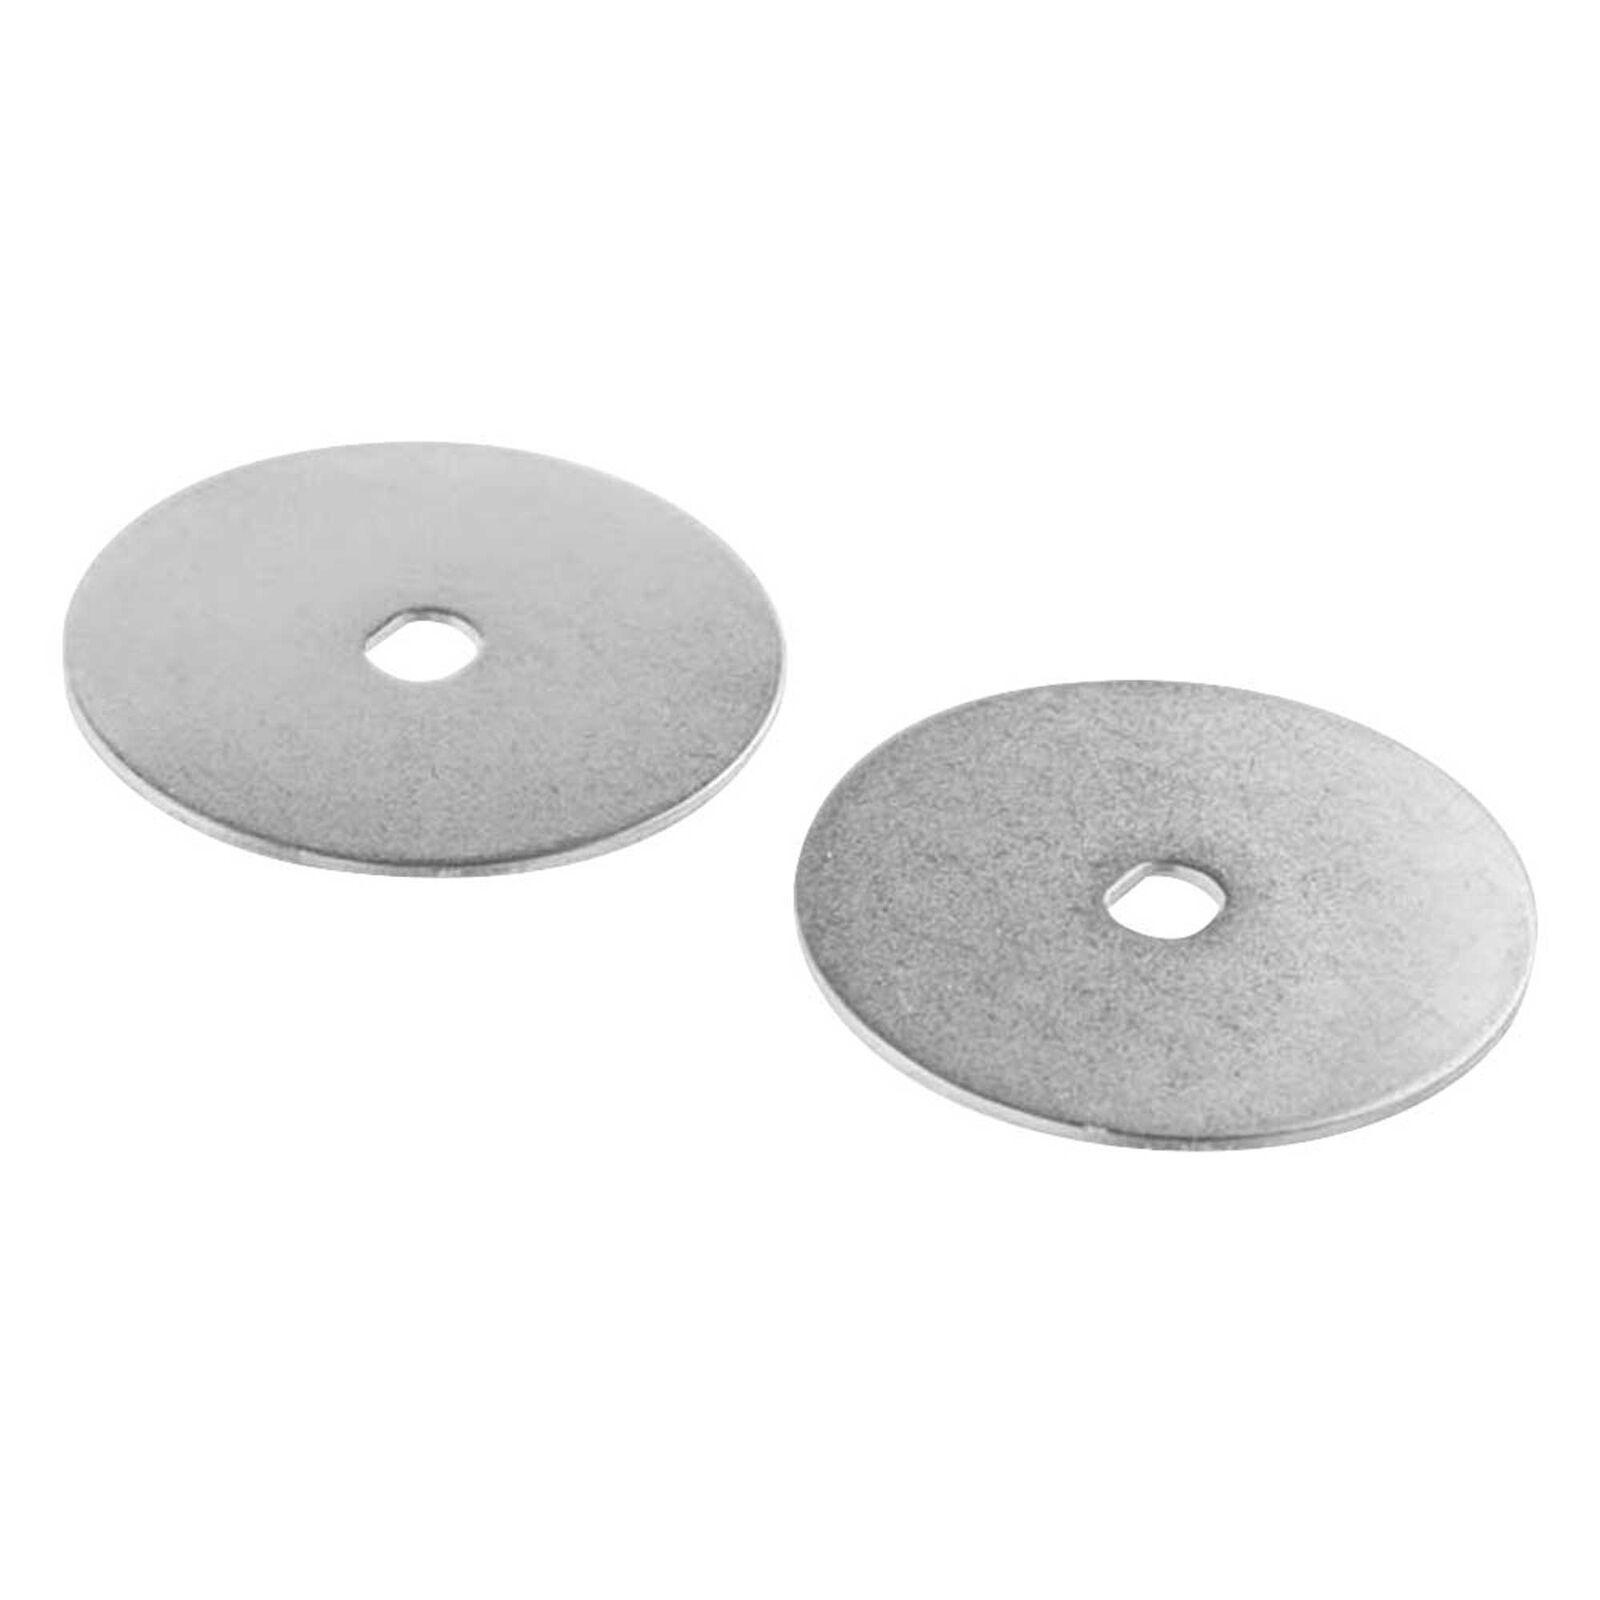 Slipper Plate Washer 33x1mm Yeti (2)